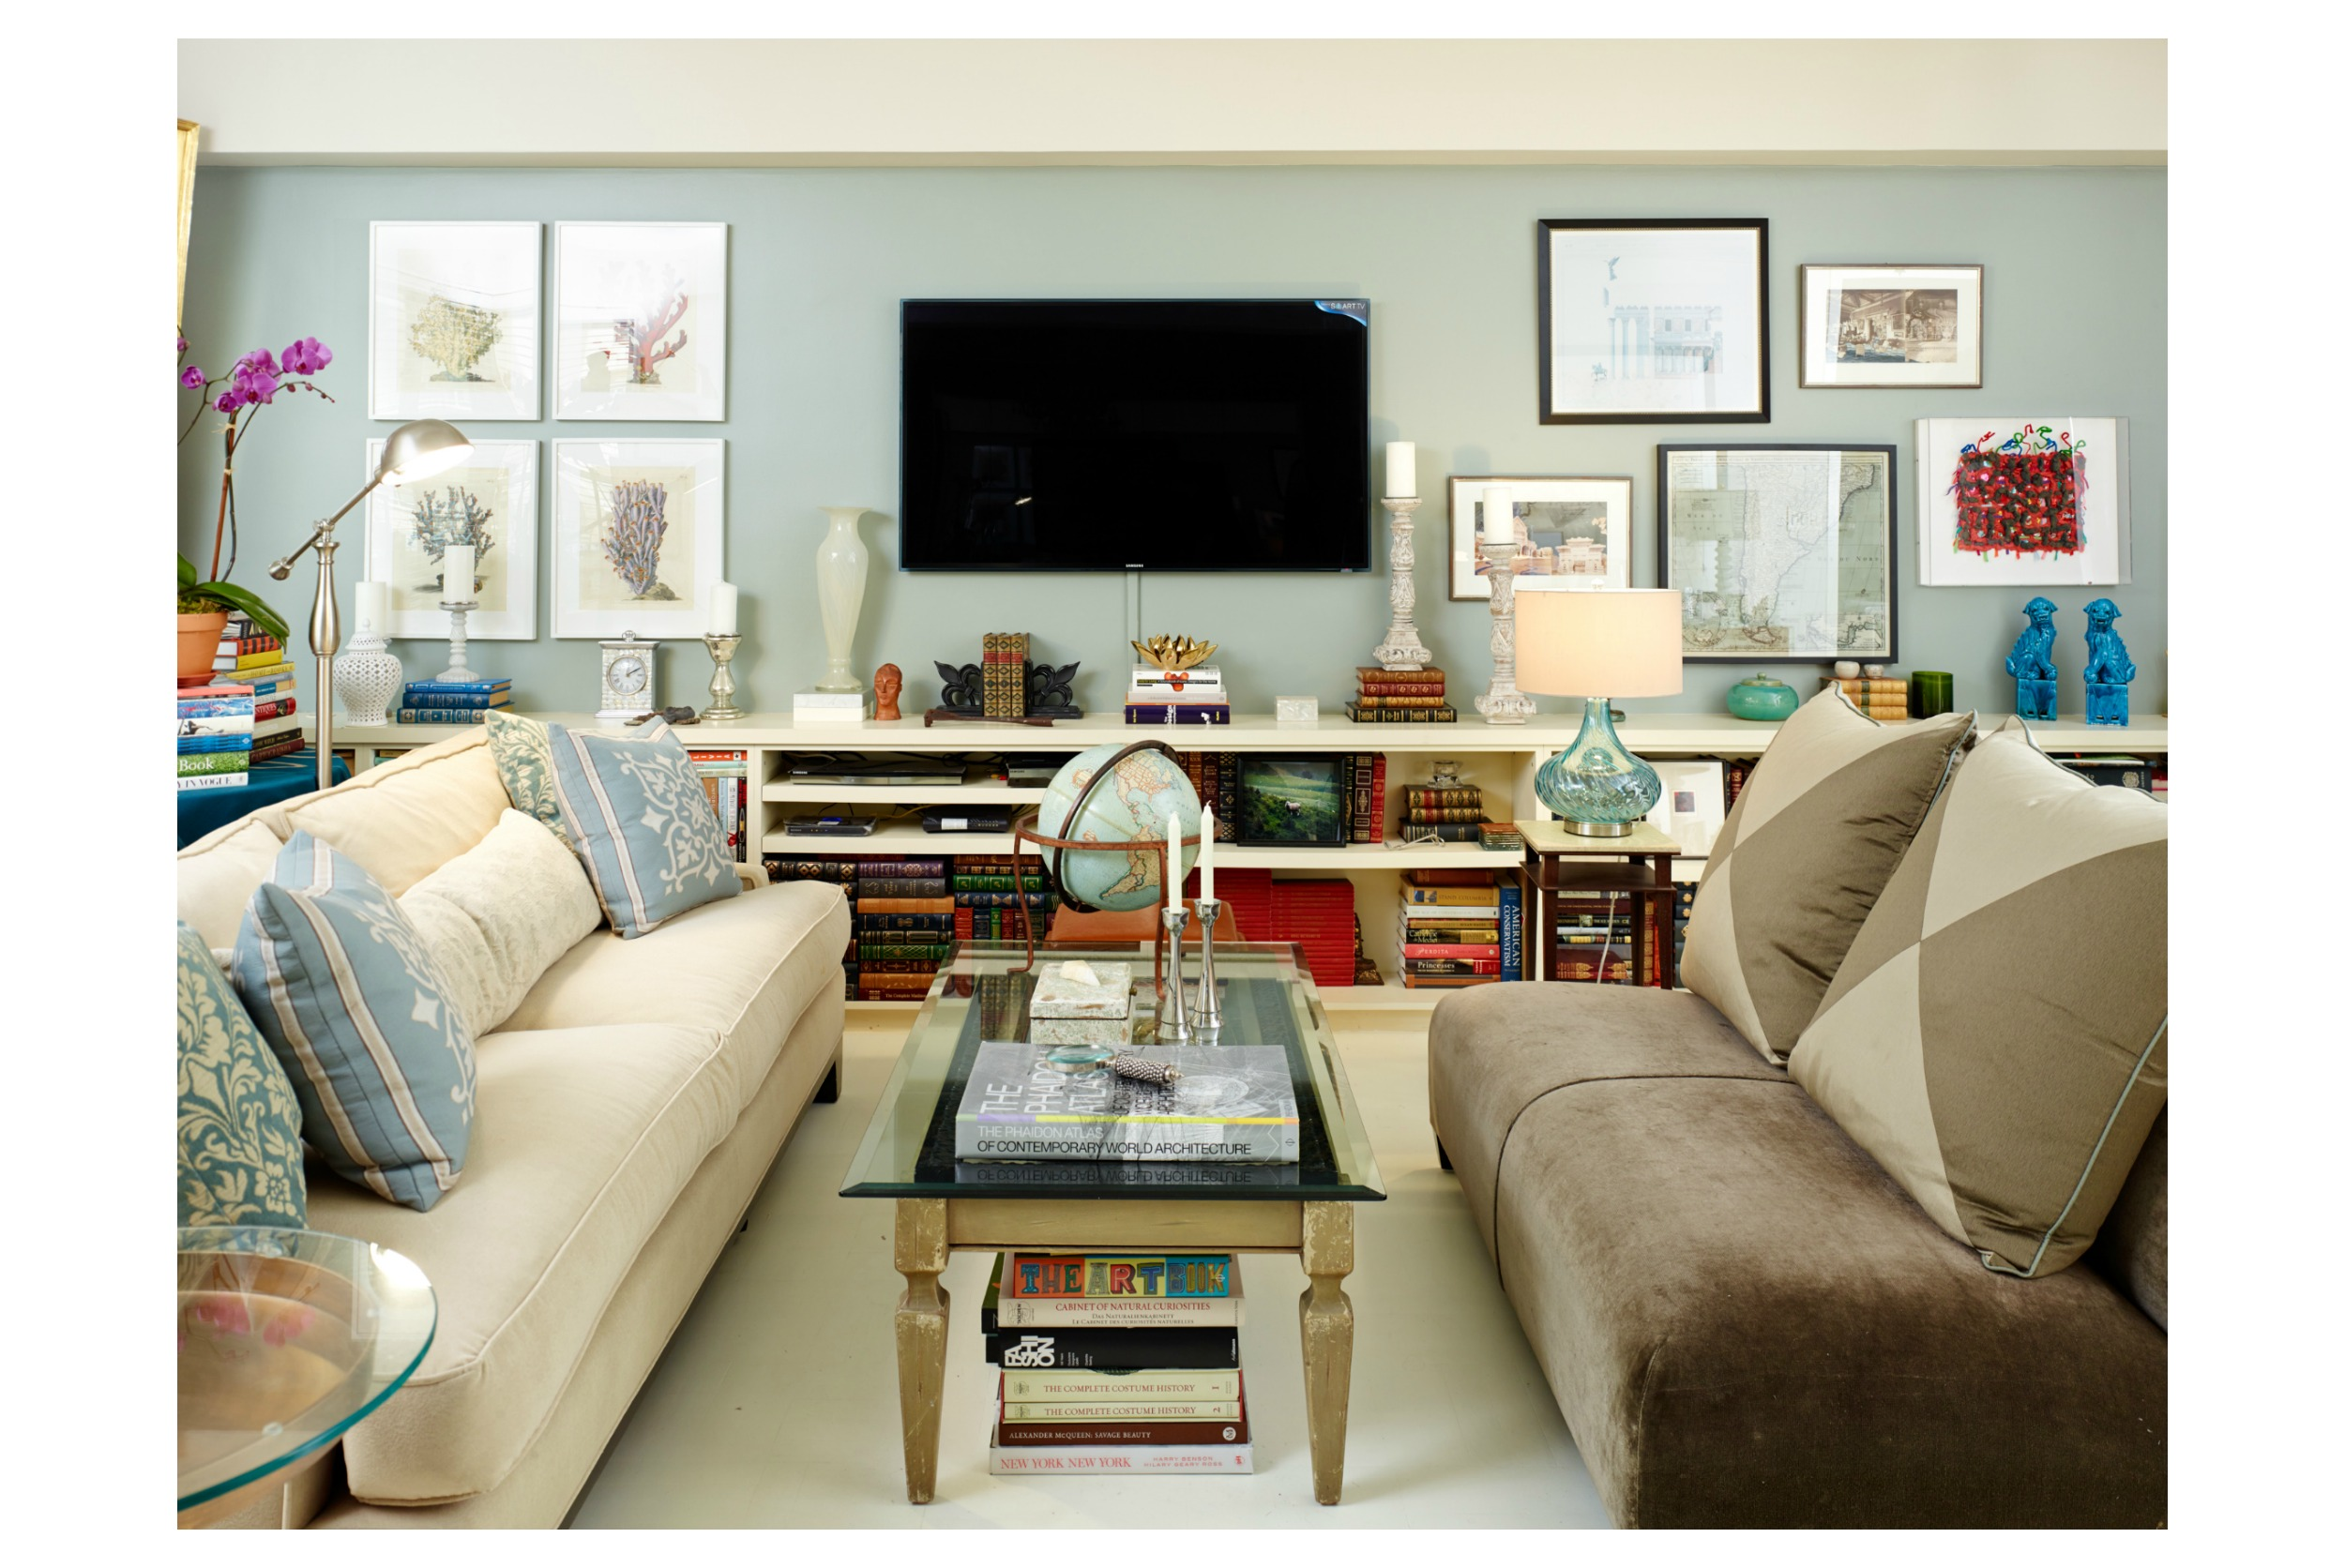 greenwich-village-living-room.jpg